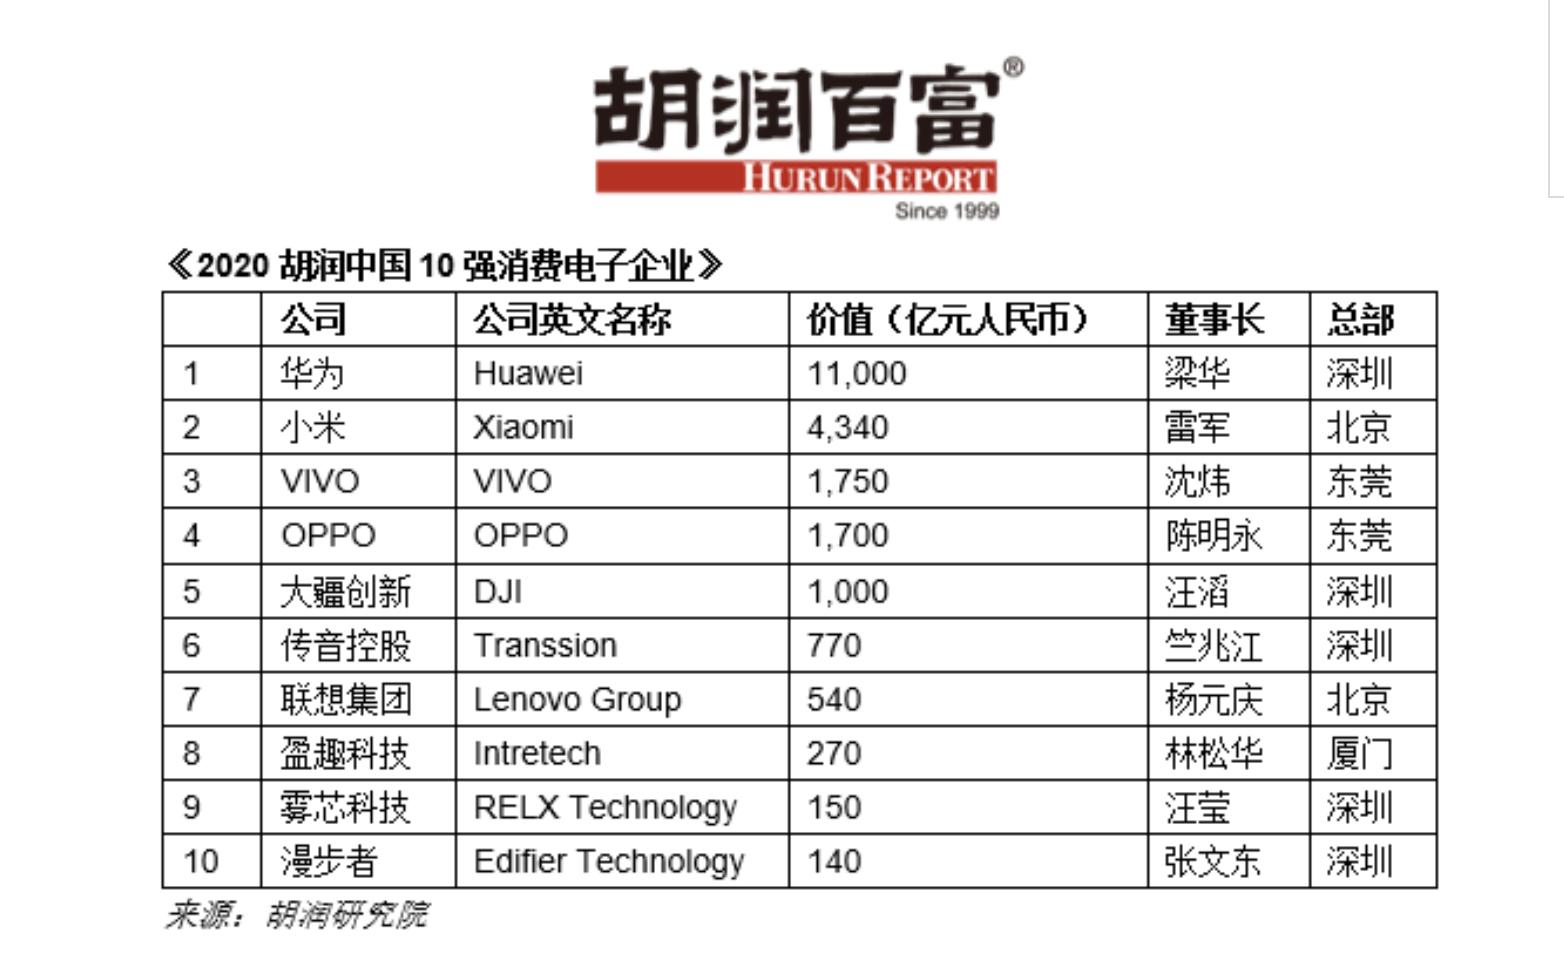 e2df9da0f57444c2afefddd5b2eae972.png 胡润百富发布2020中国消费电子10强企业:华为最值钱,VIVO超OPPO  消费与科技